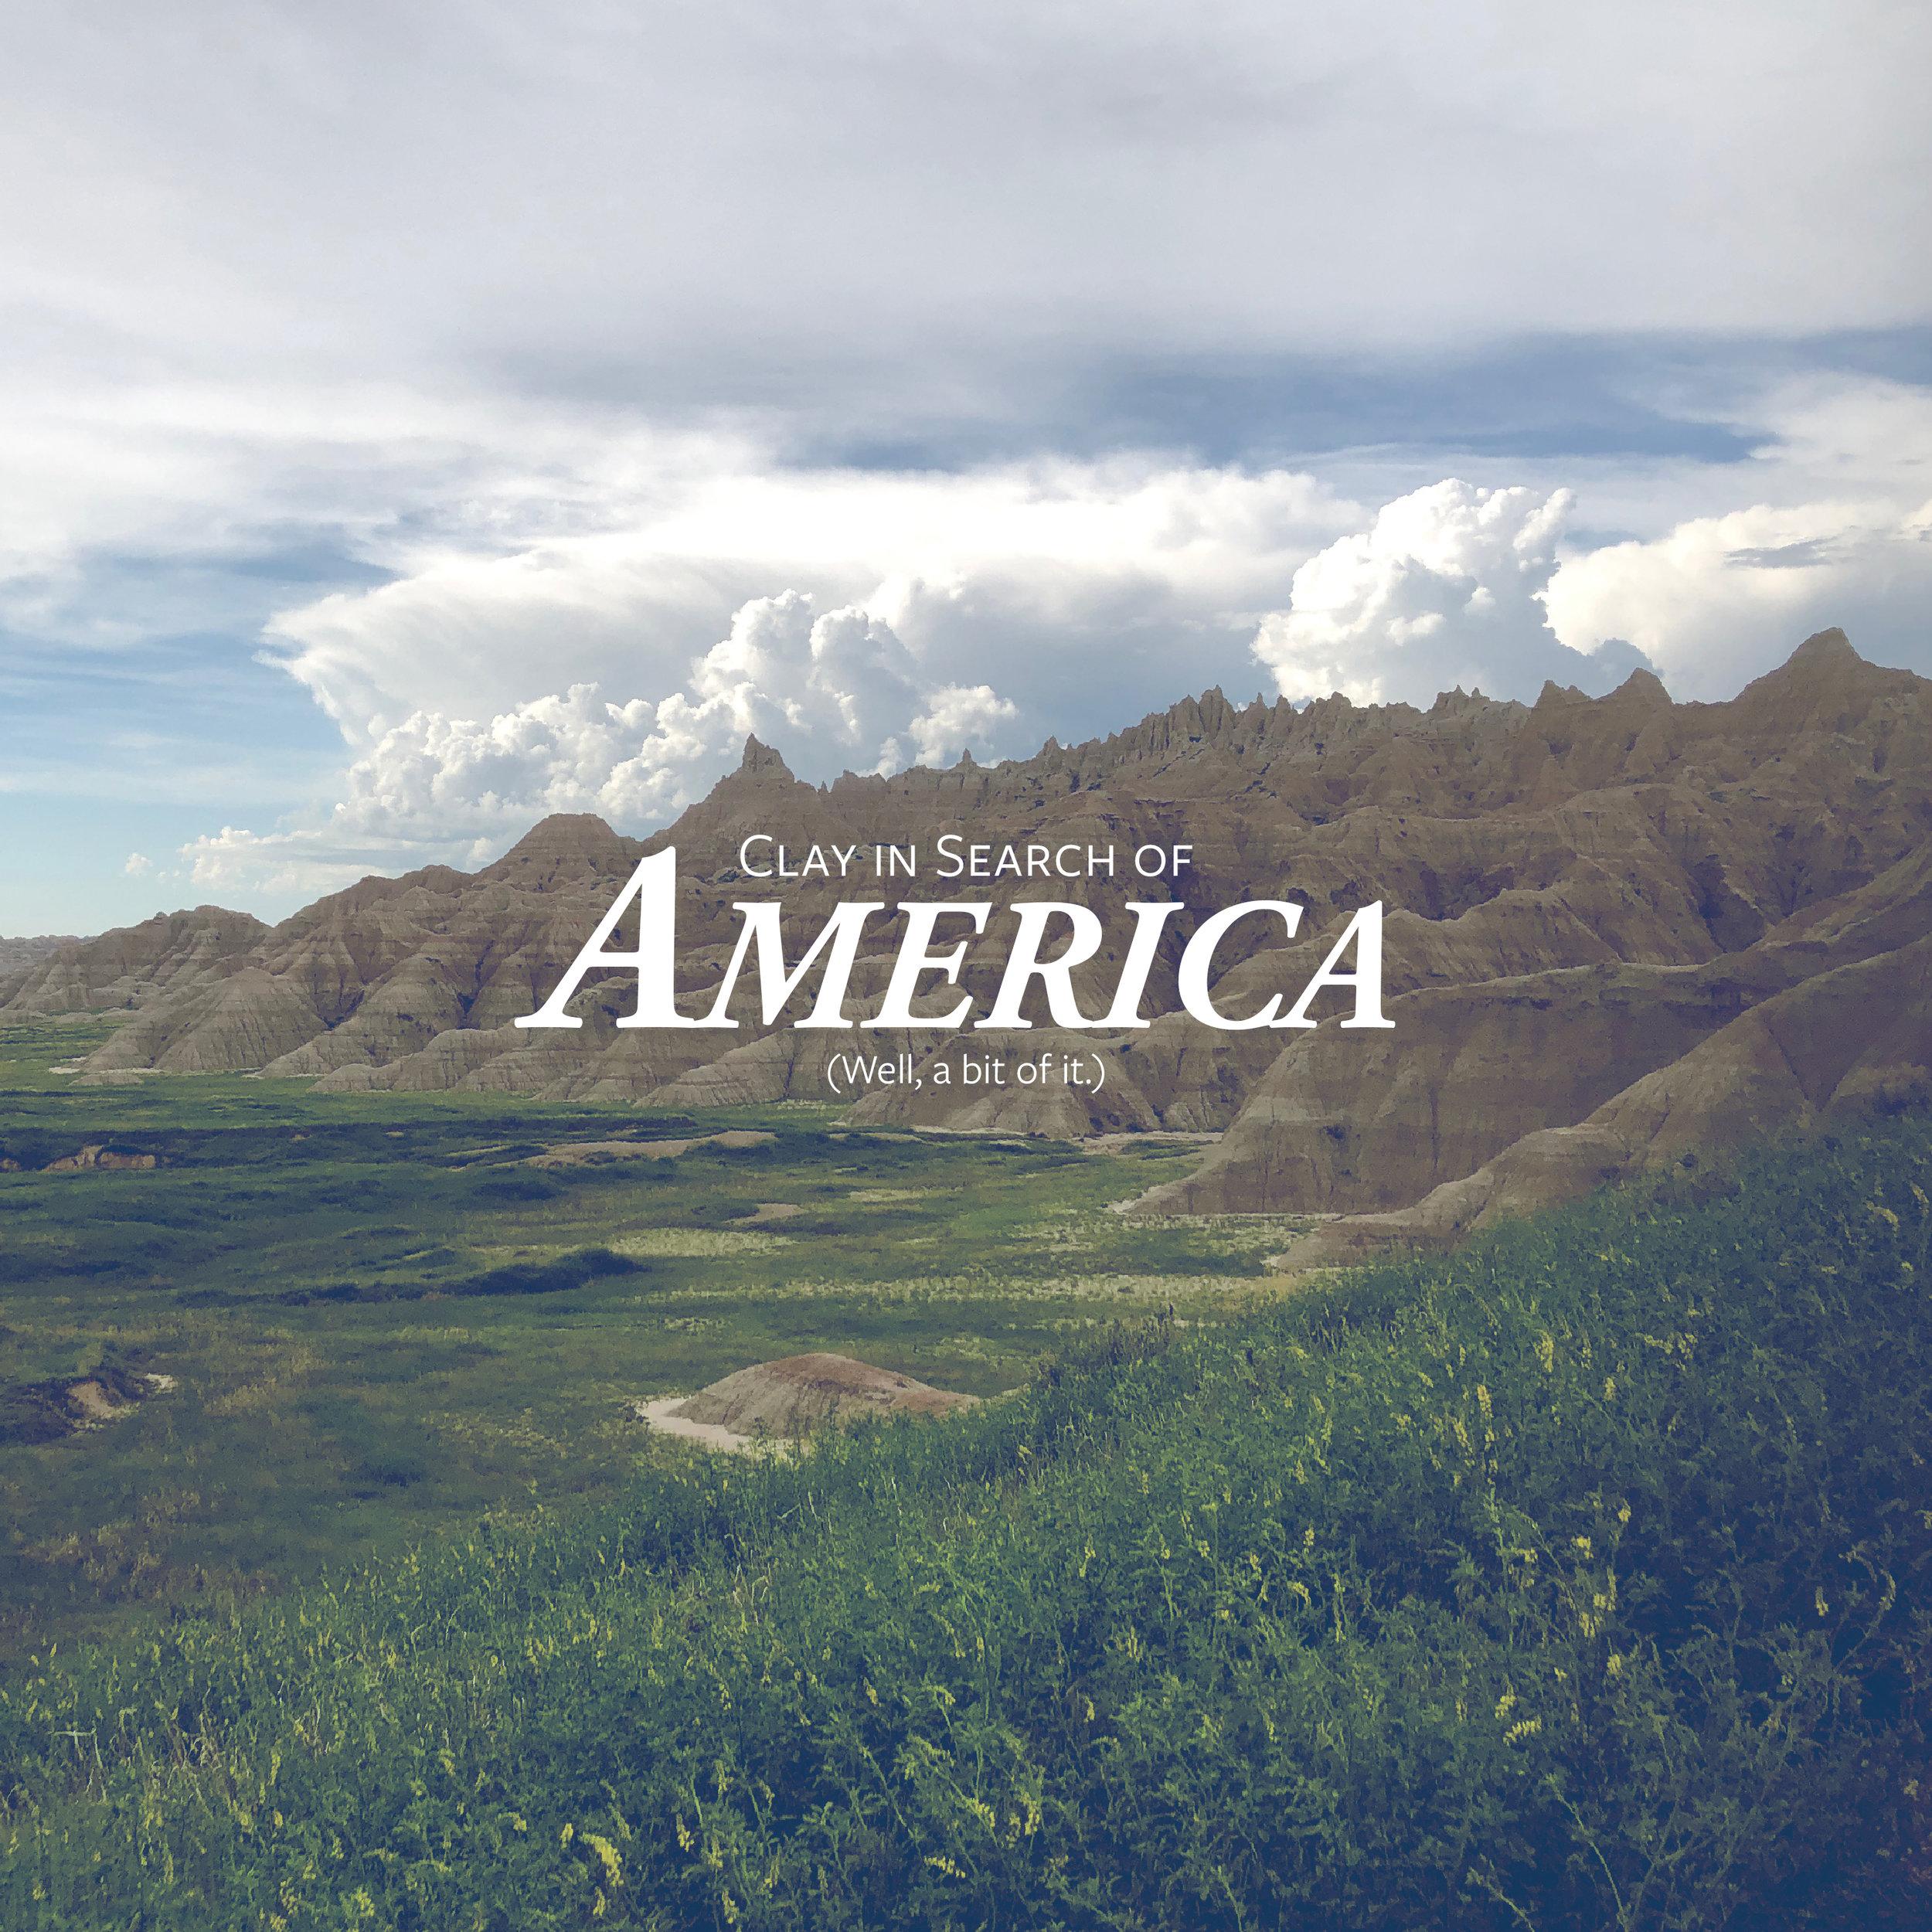 America 1.jpg